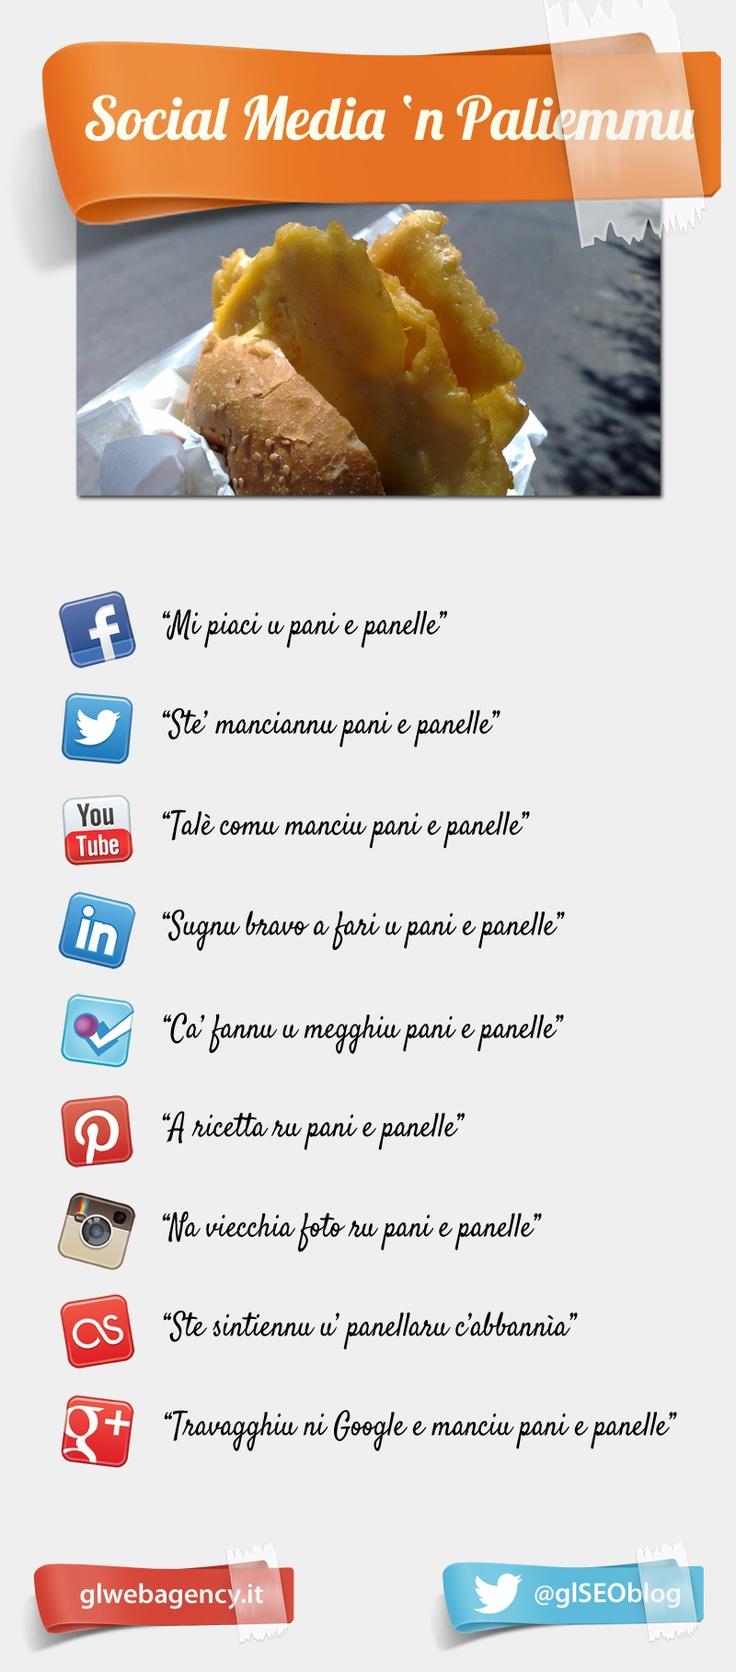 "Social Media 'n Paliemmu: i social network spiegati ""cu pani e panelle""!"